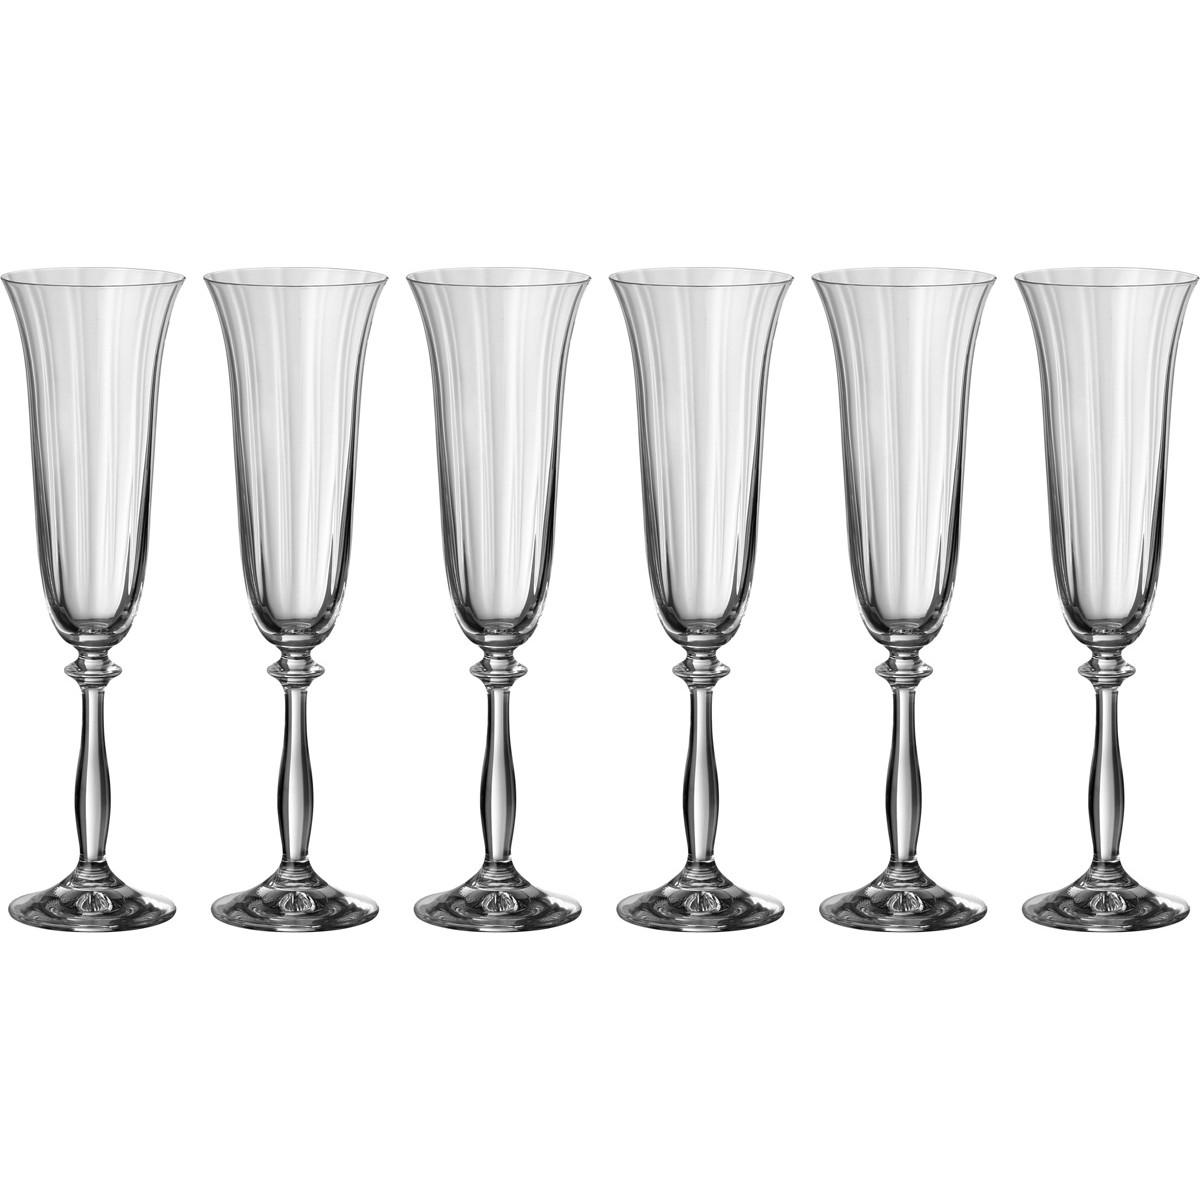 {} Bohemia Crystal Набор бокалов для шампанского Darlene  (24 см - 6 шт) crystal bohemia